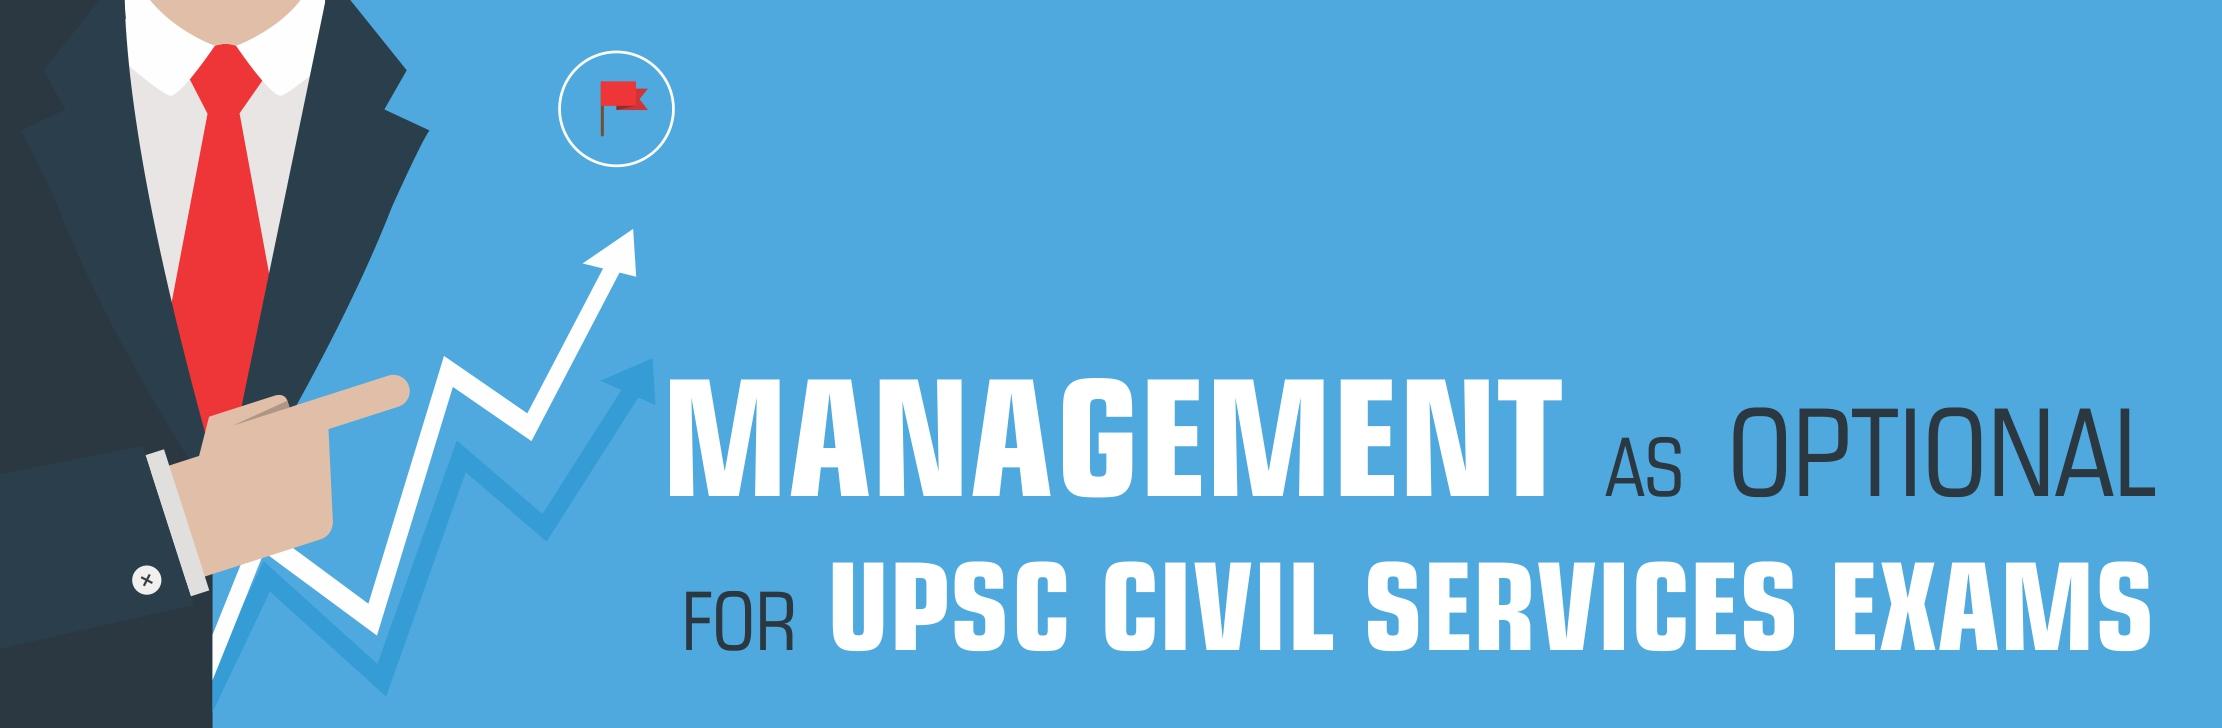 Upsc - Management As Optional For Upsc Civil Services Exams